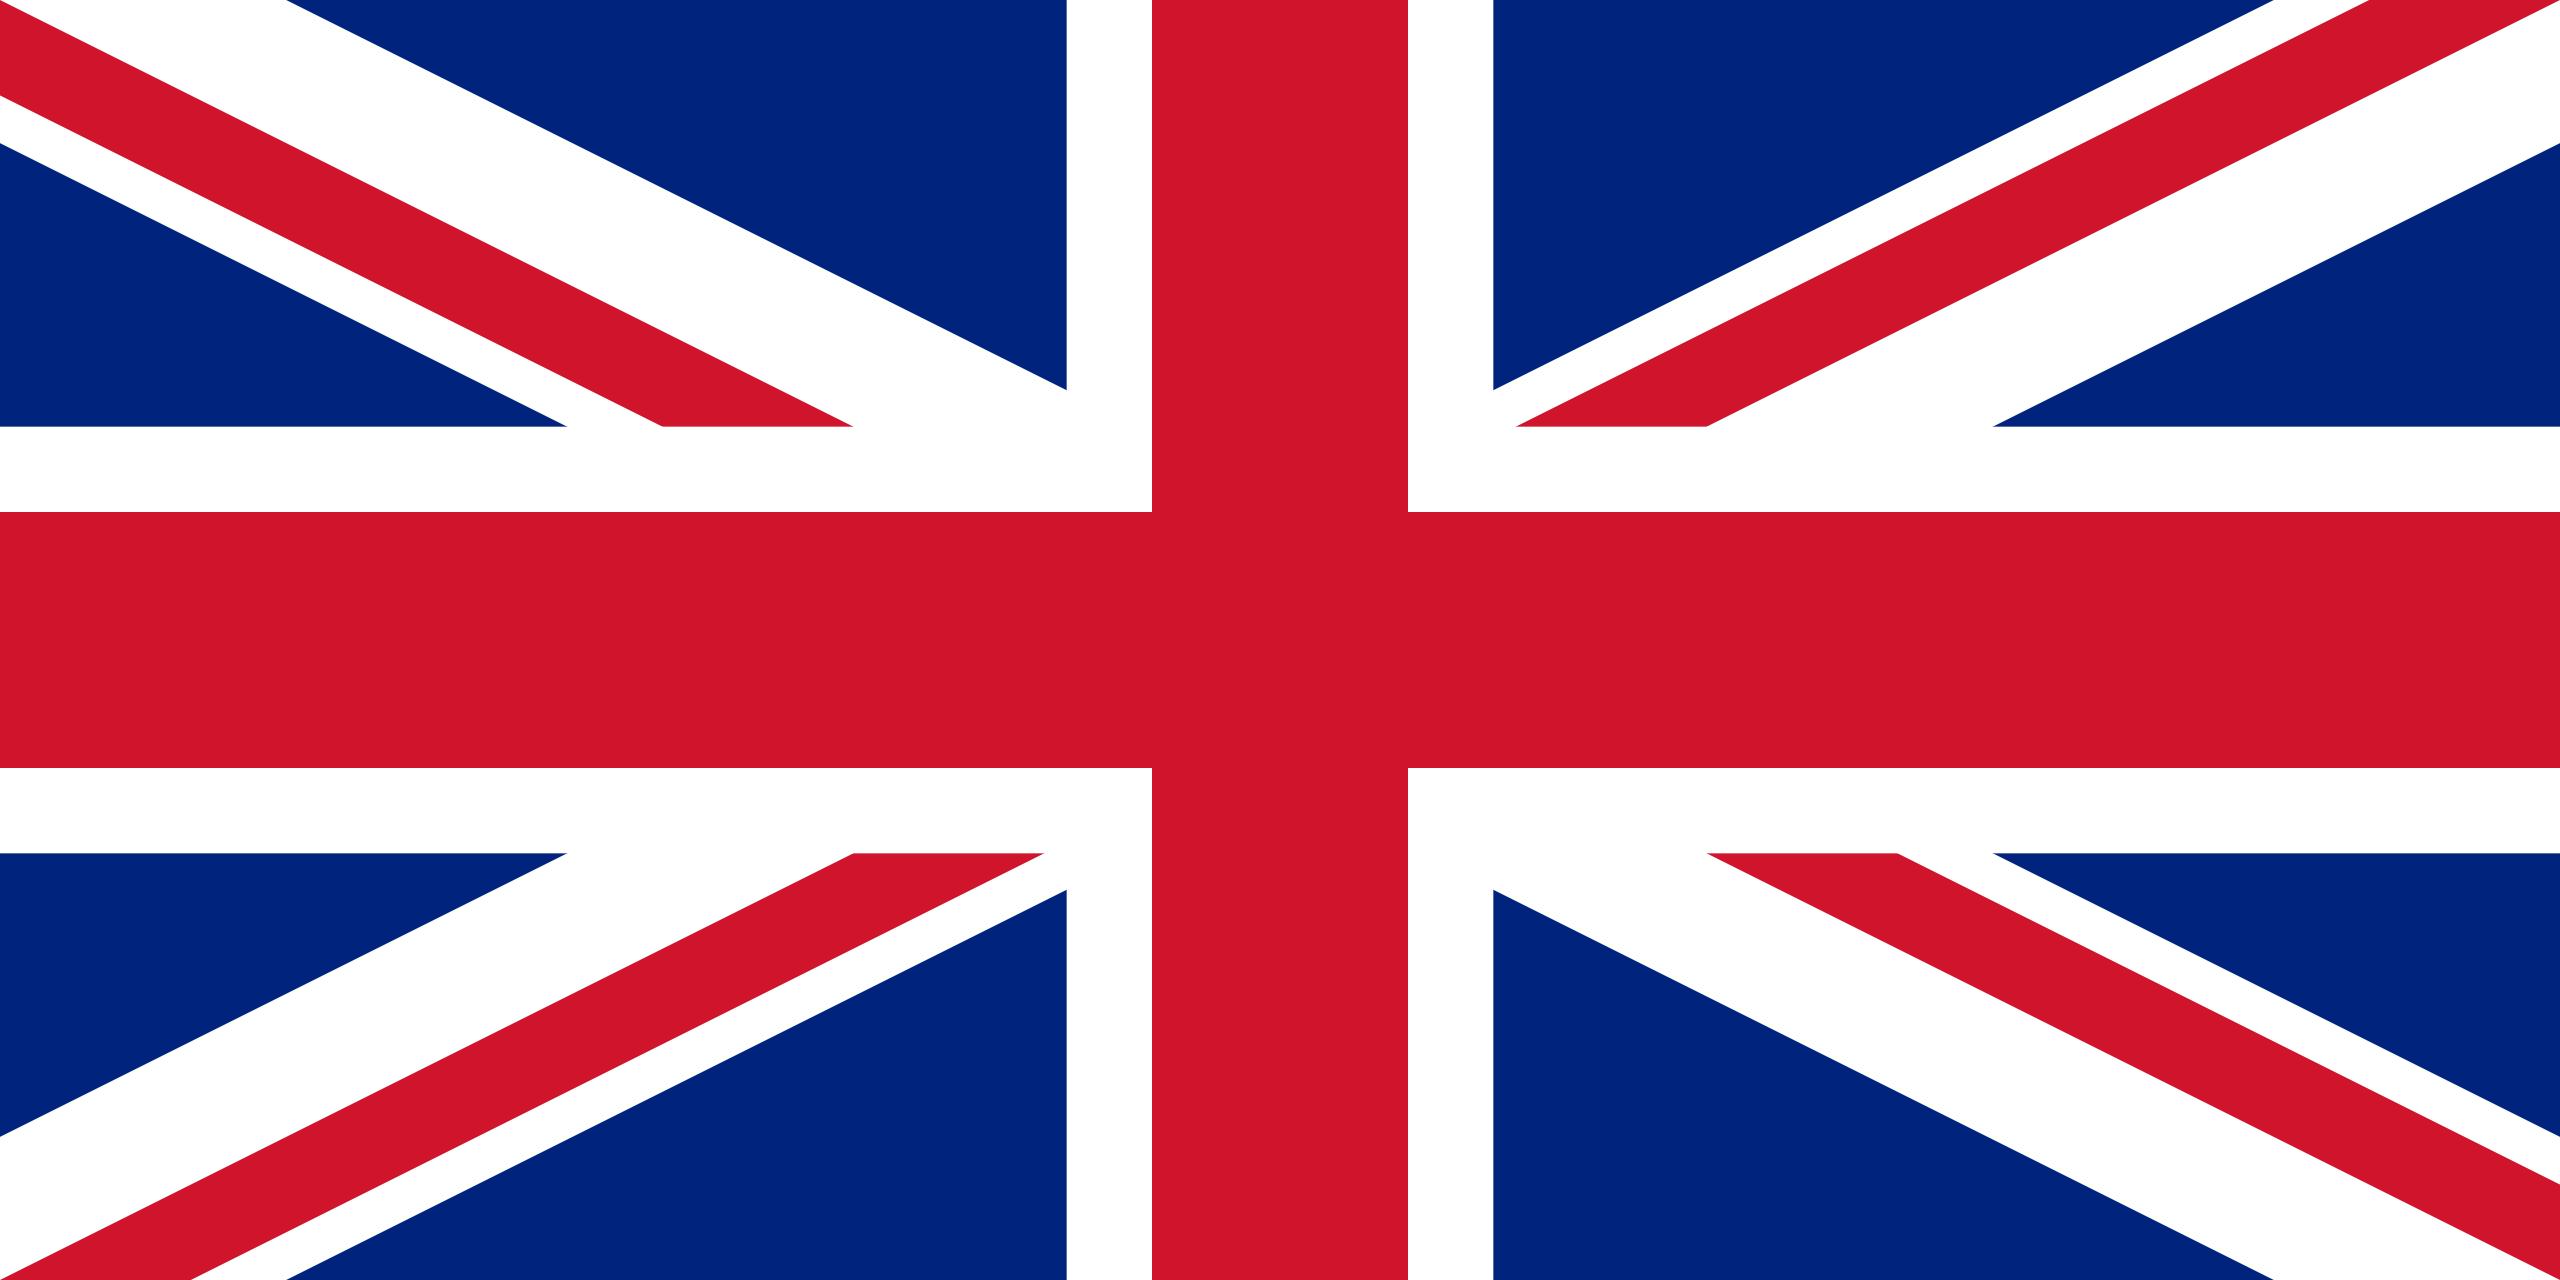 unitedkingdom 25 04 16